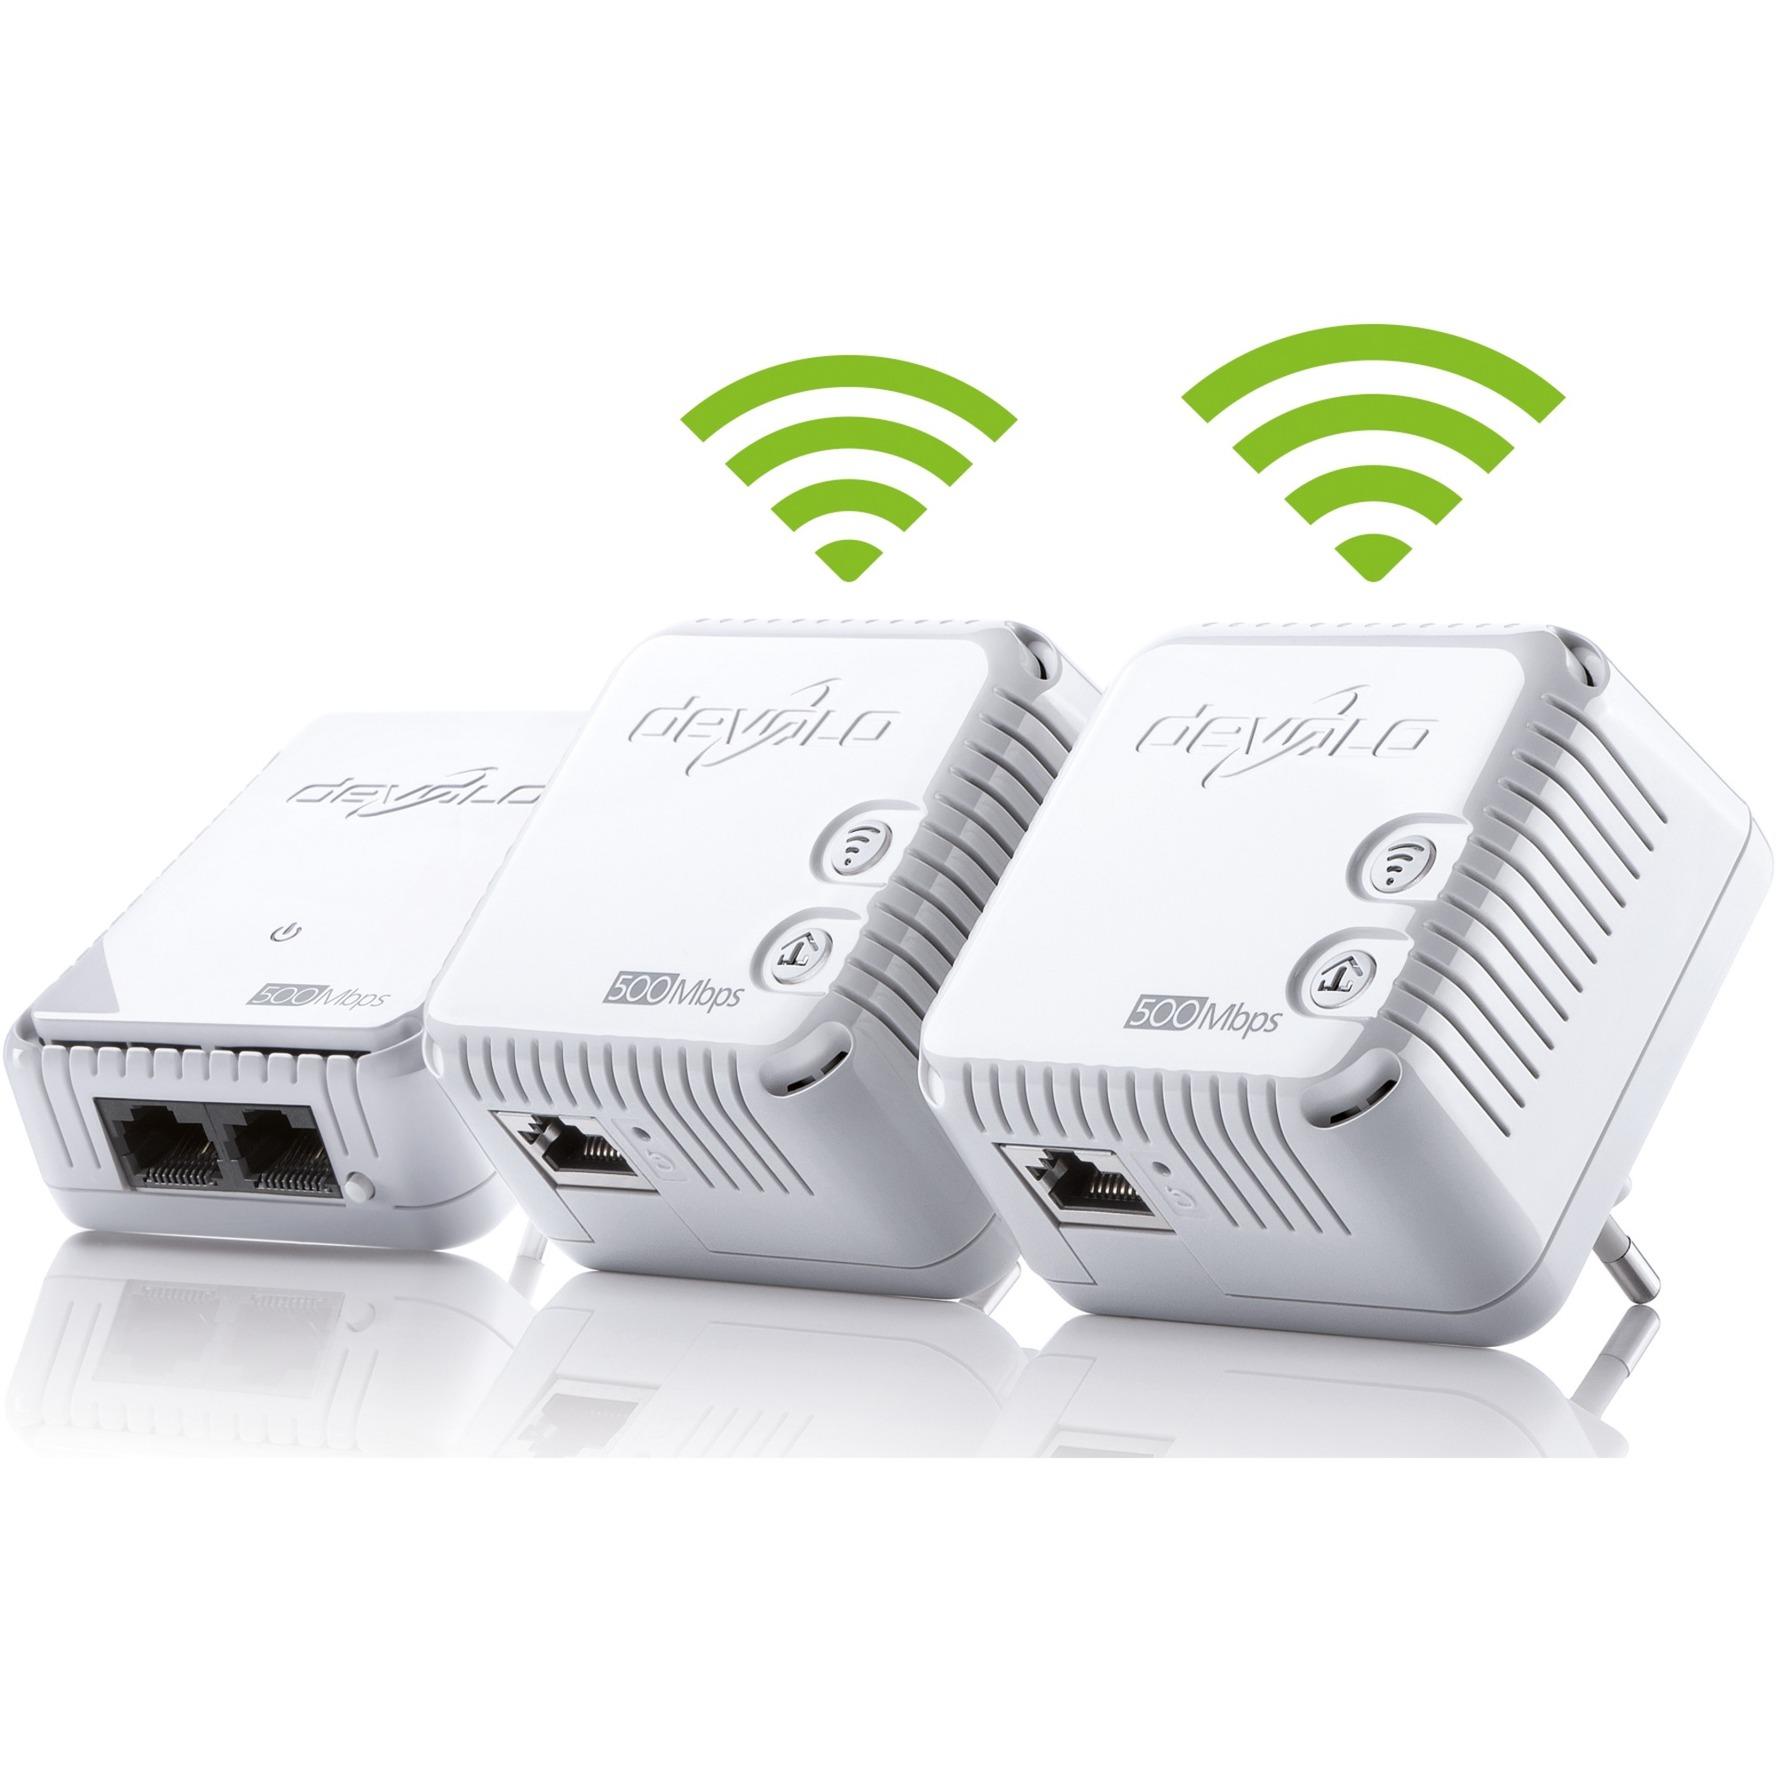 Devolo Dlan 500 Wifi Network Kit Powerline Wlan Wei 500mbit Adapters An Alternative To Ethernet Cable Wireless 1xlan Repeater 3 Adapter